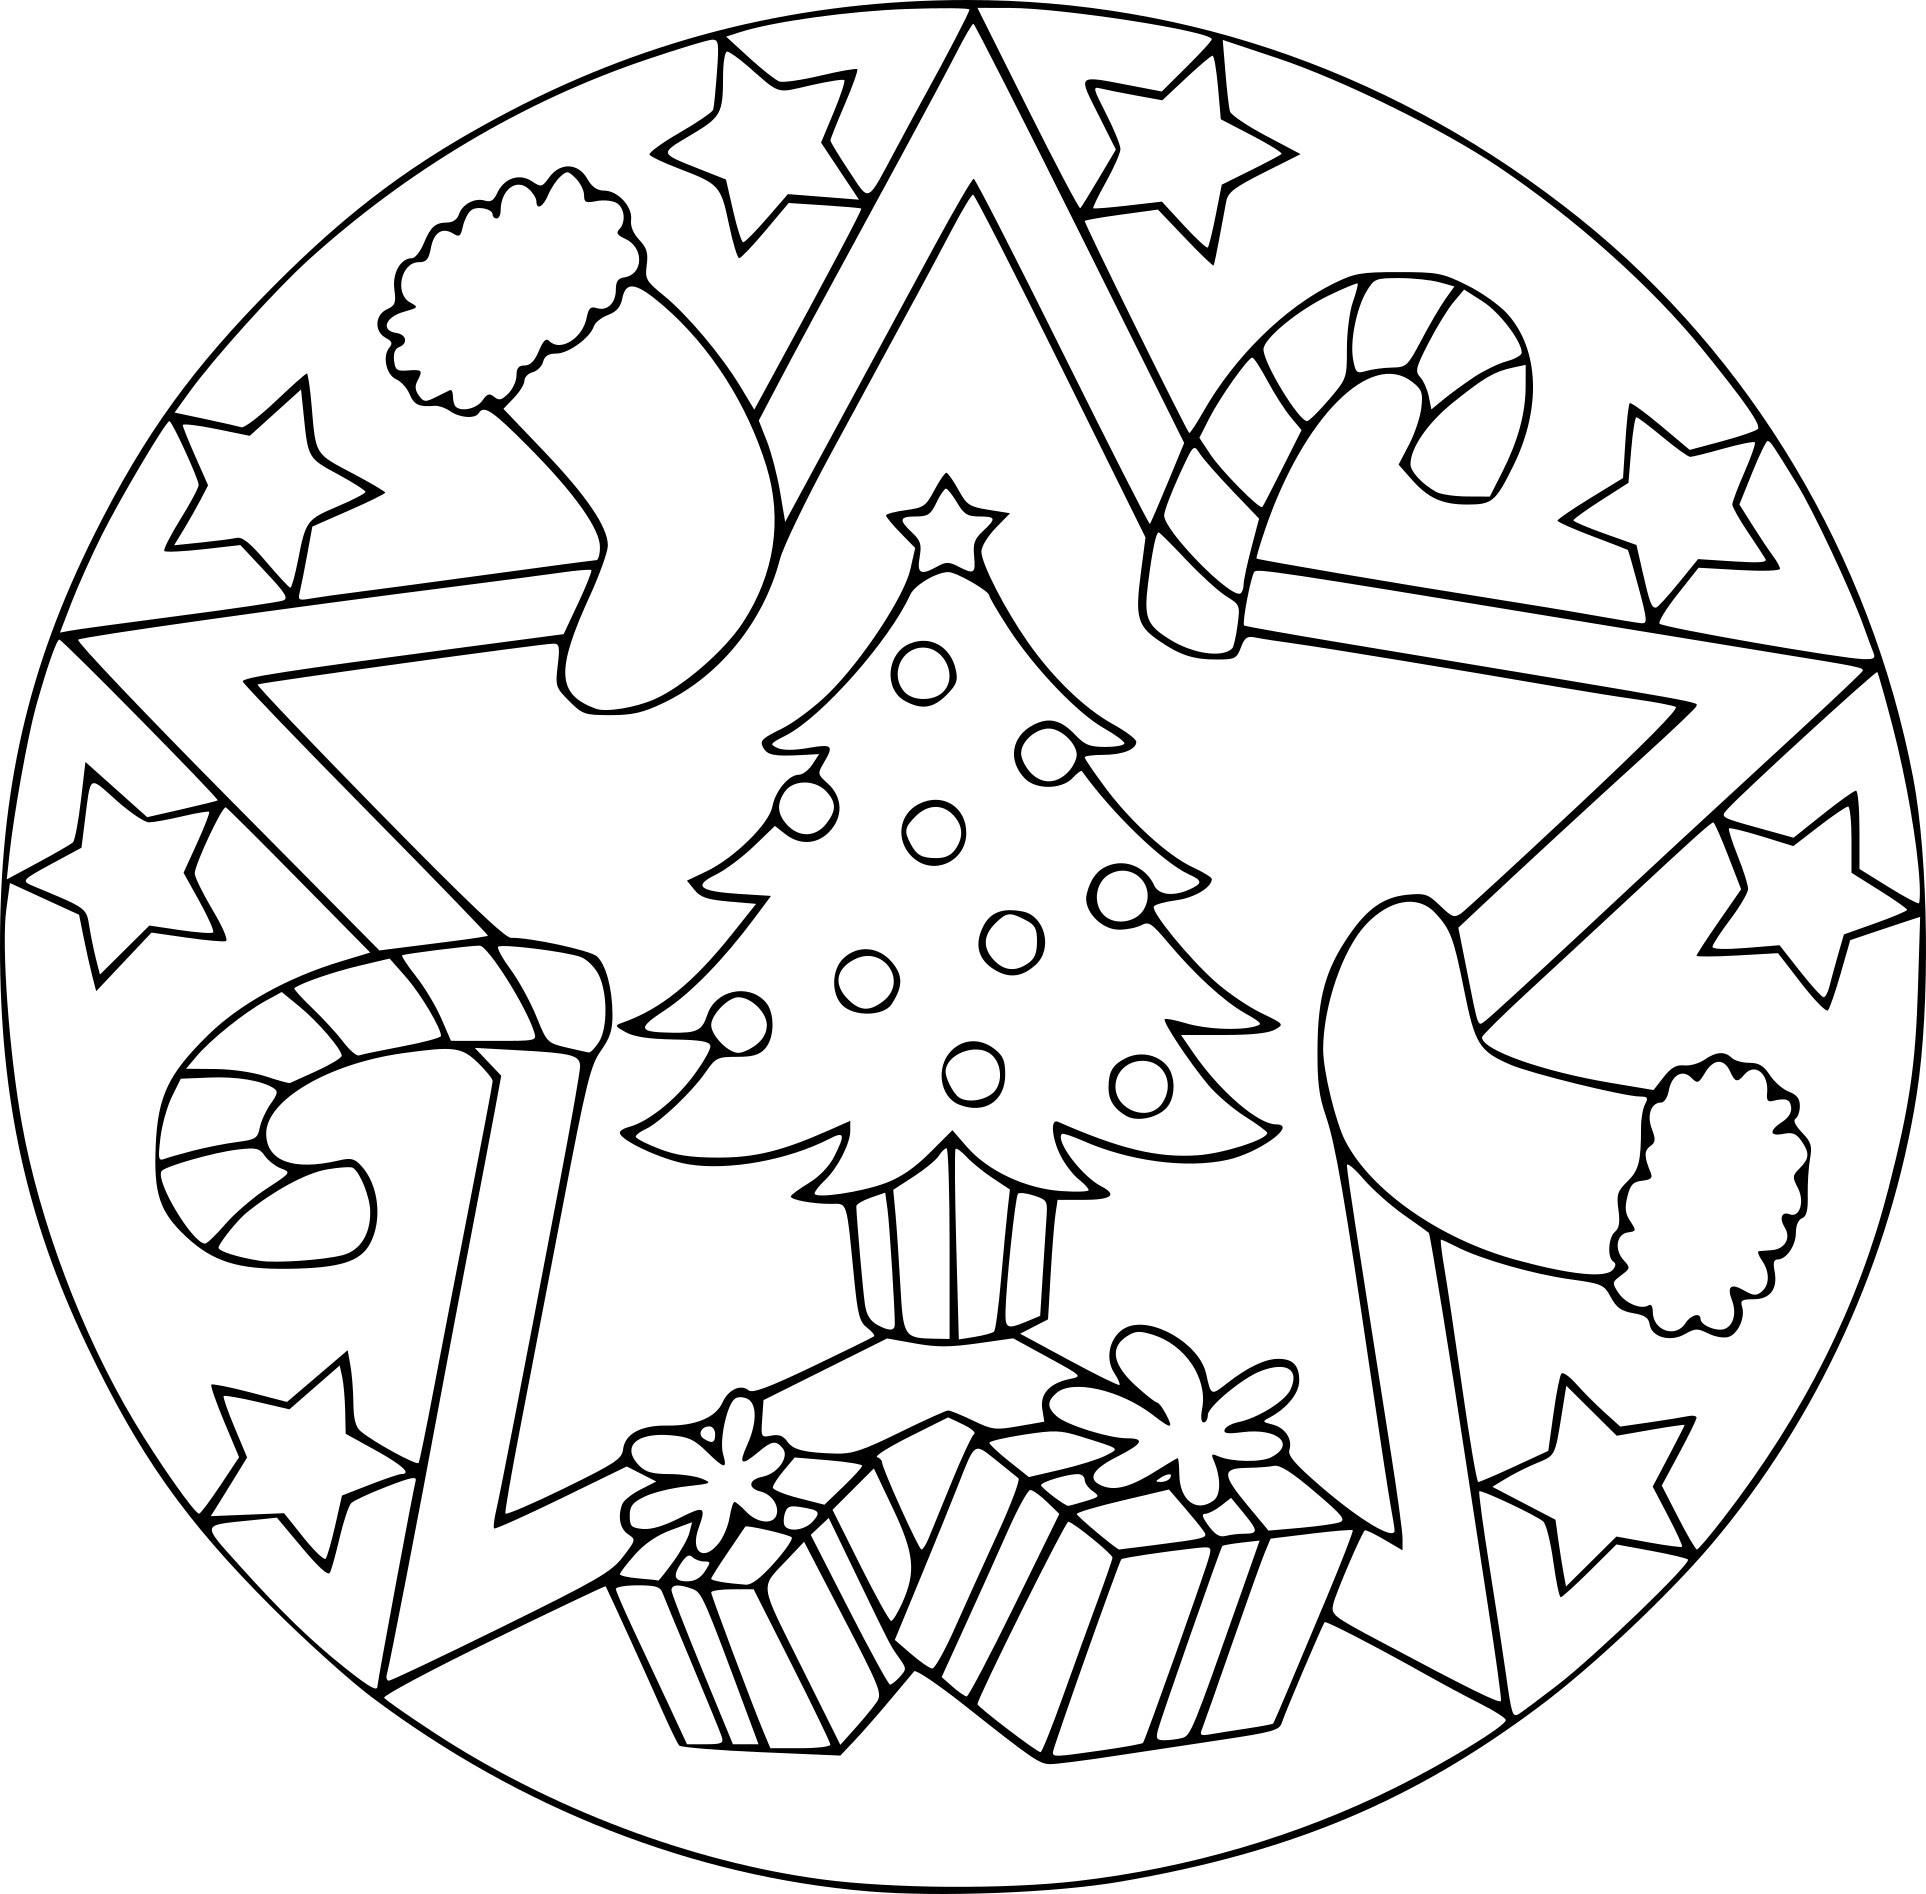 Coloriage Mandala Noël à Imprimer